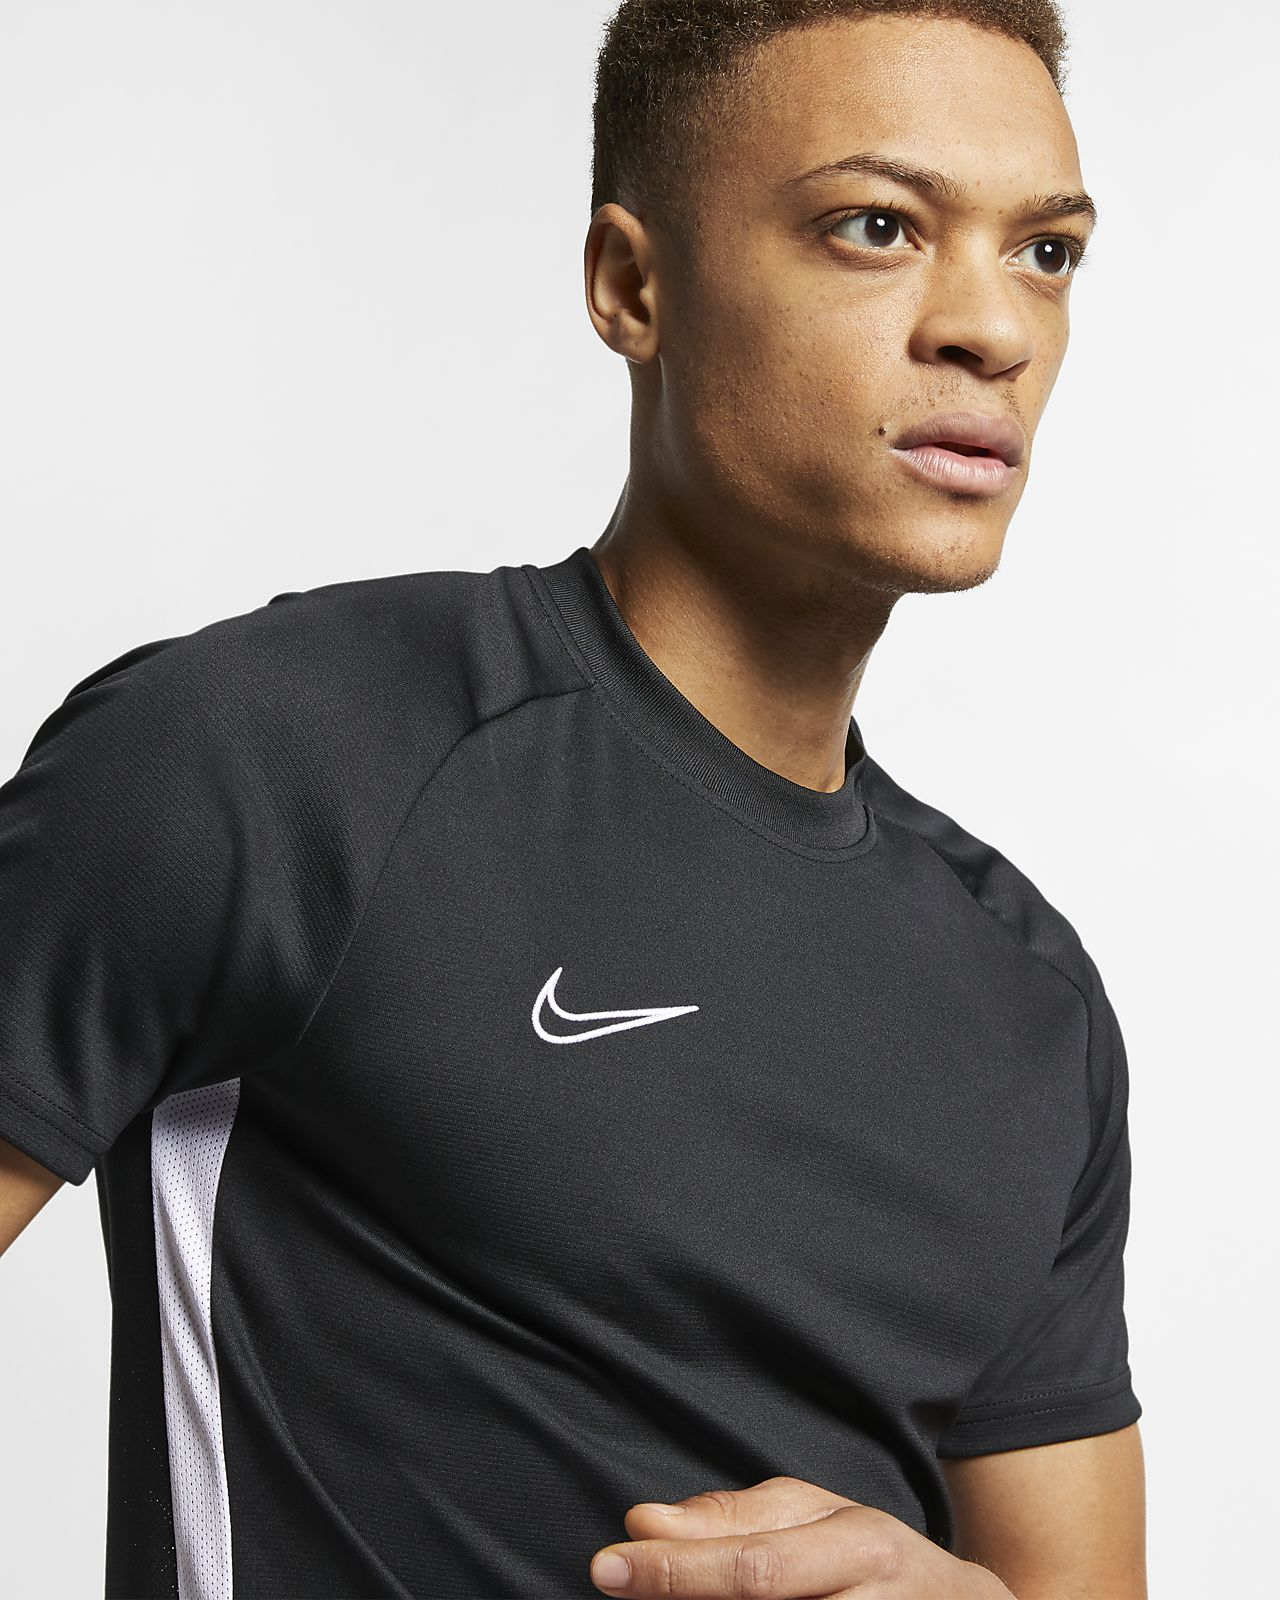 d07d8cca4 Nike Dri-FIT Academy Men's Soccer Short-Sleeve Top. Nike.com